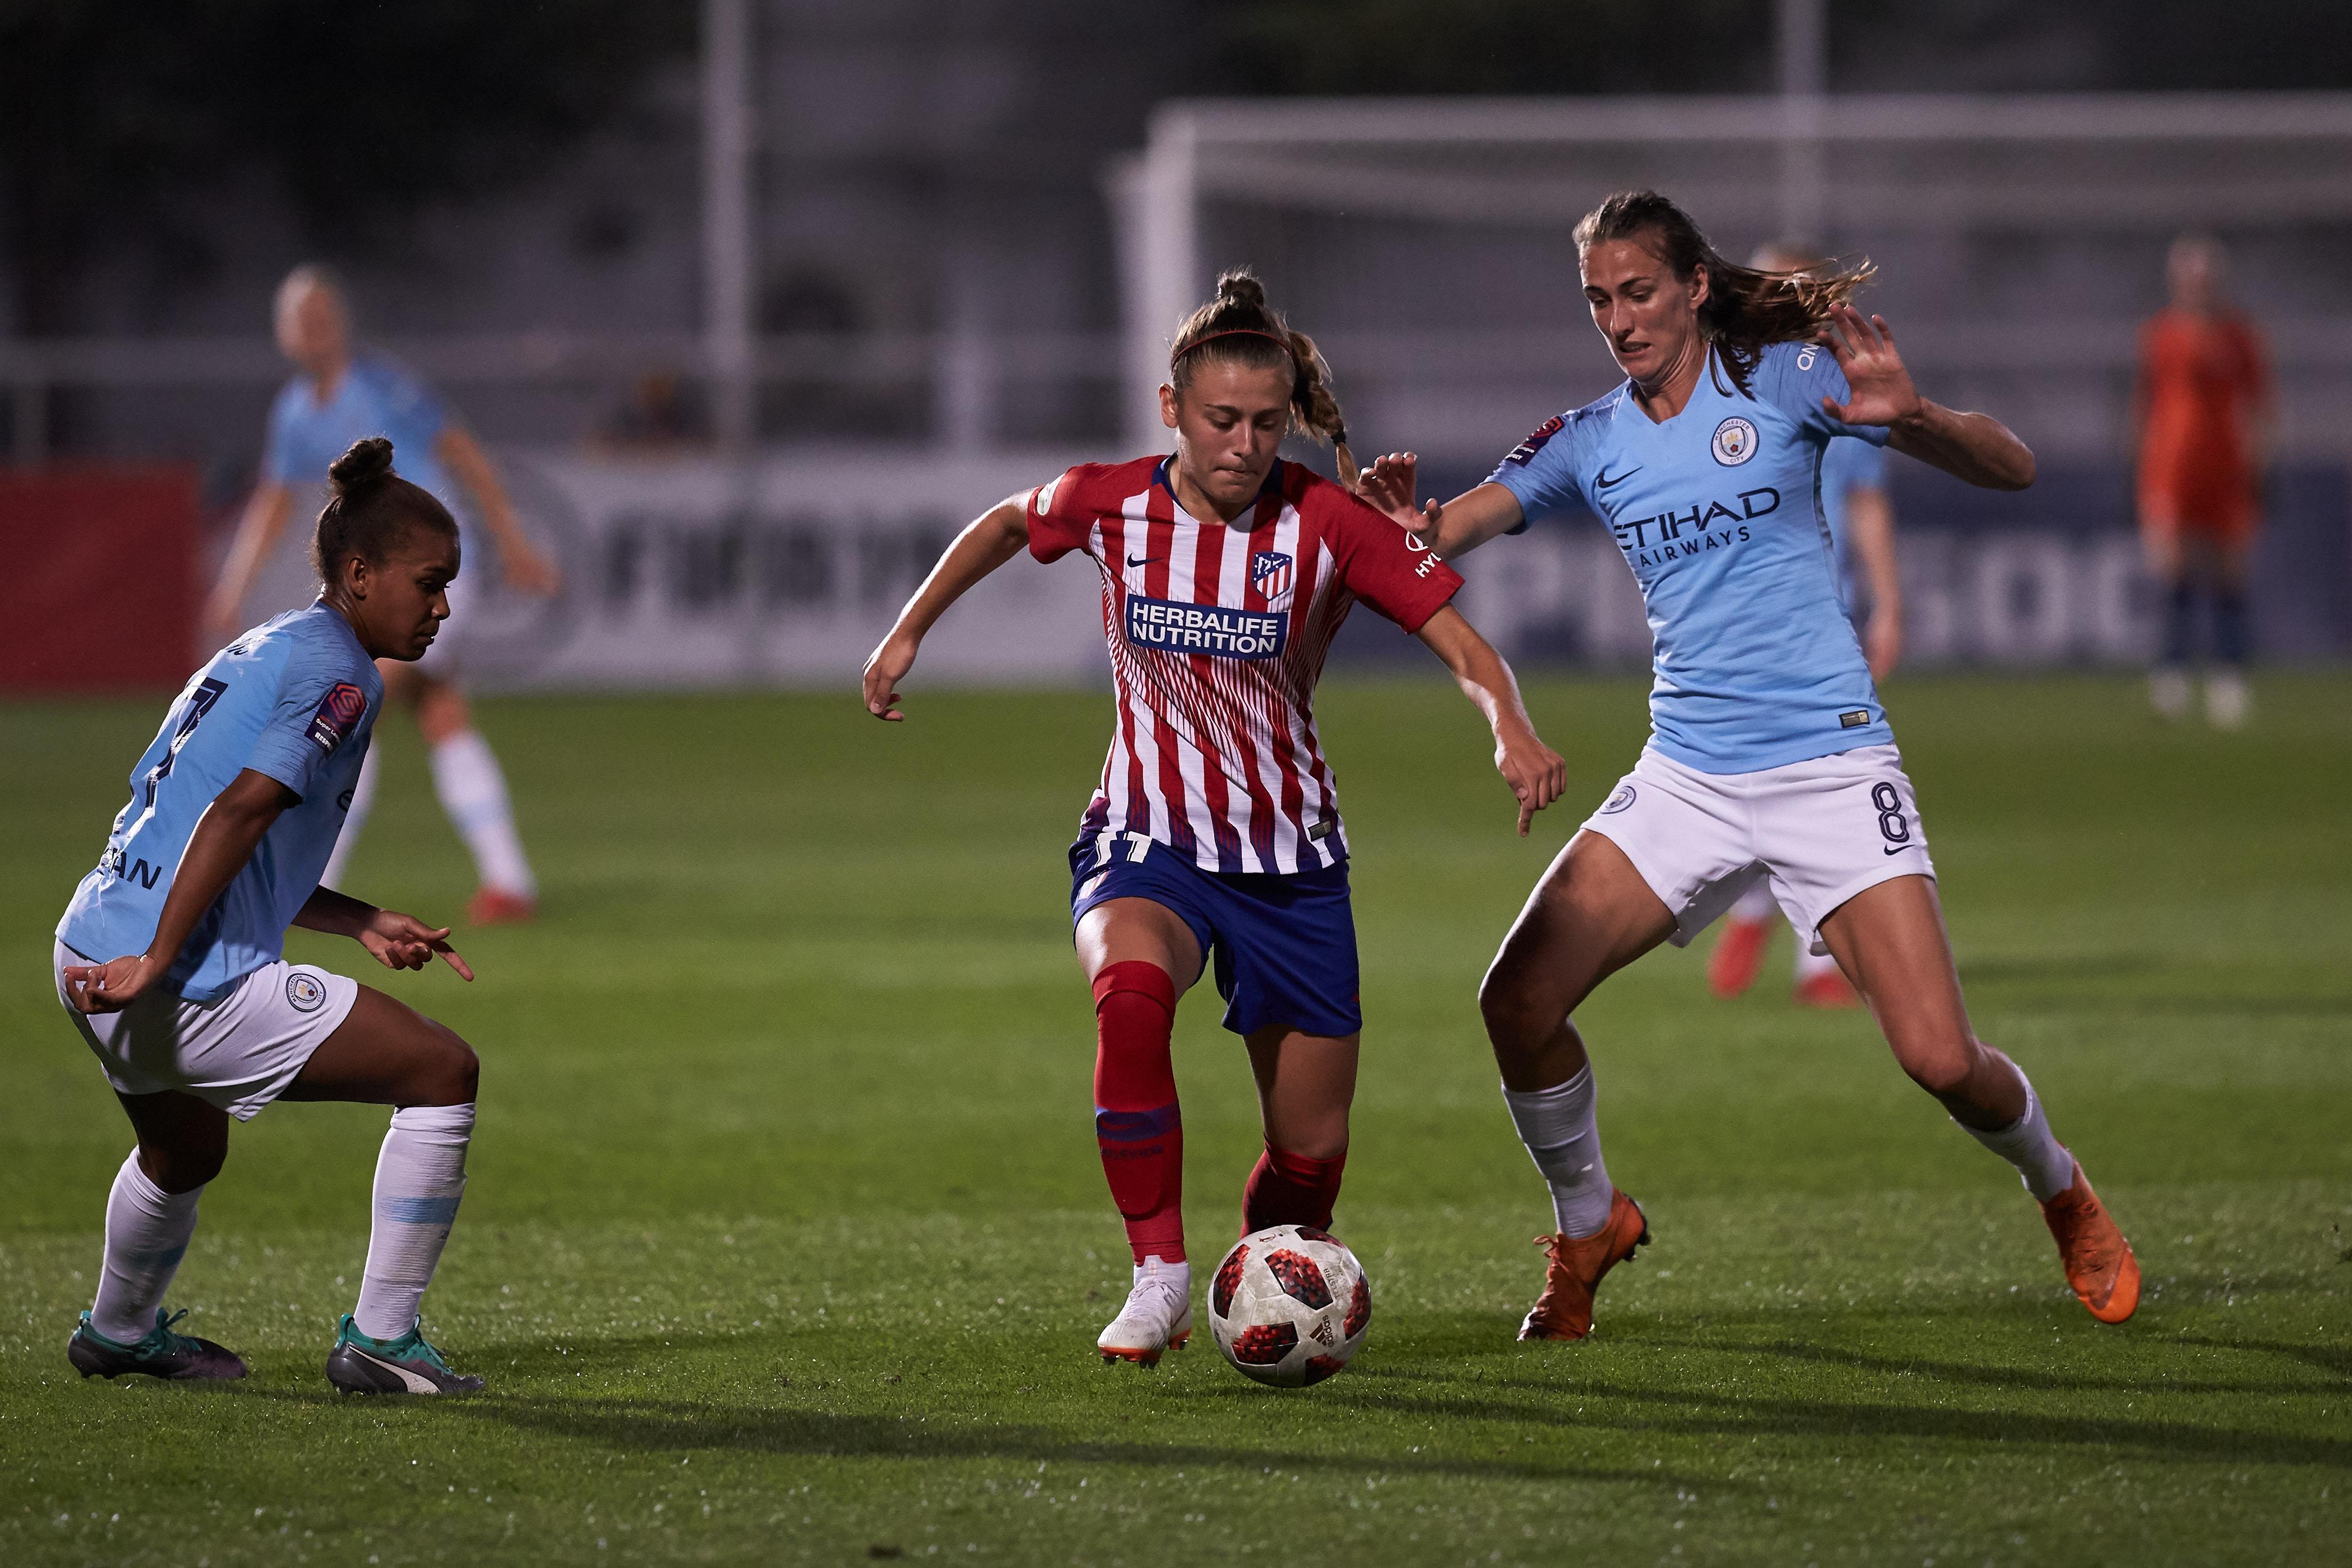 Jill Scott tries to tackle Carmen Menayo during the game in Majadahonda